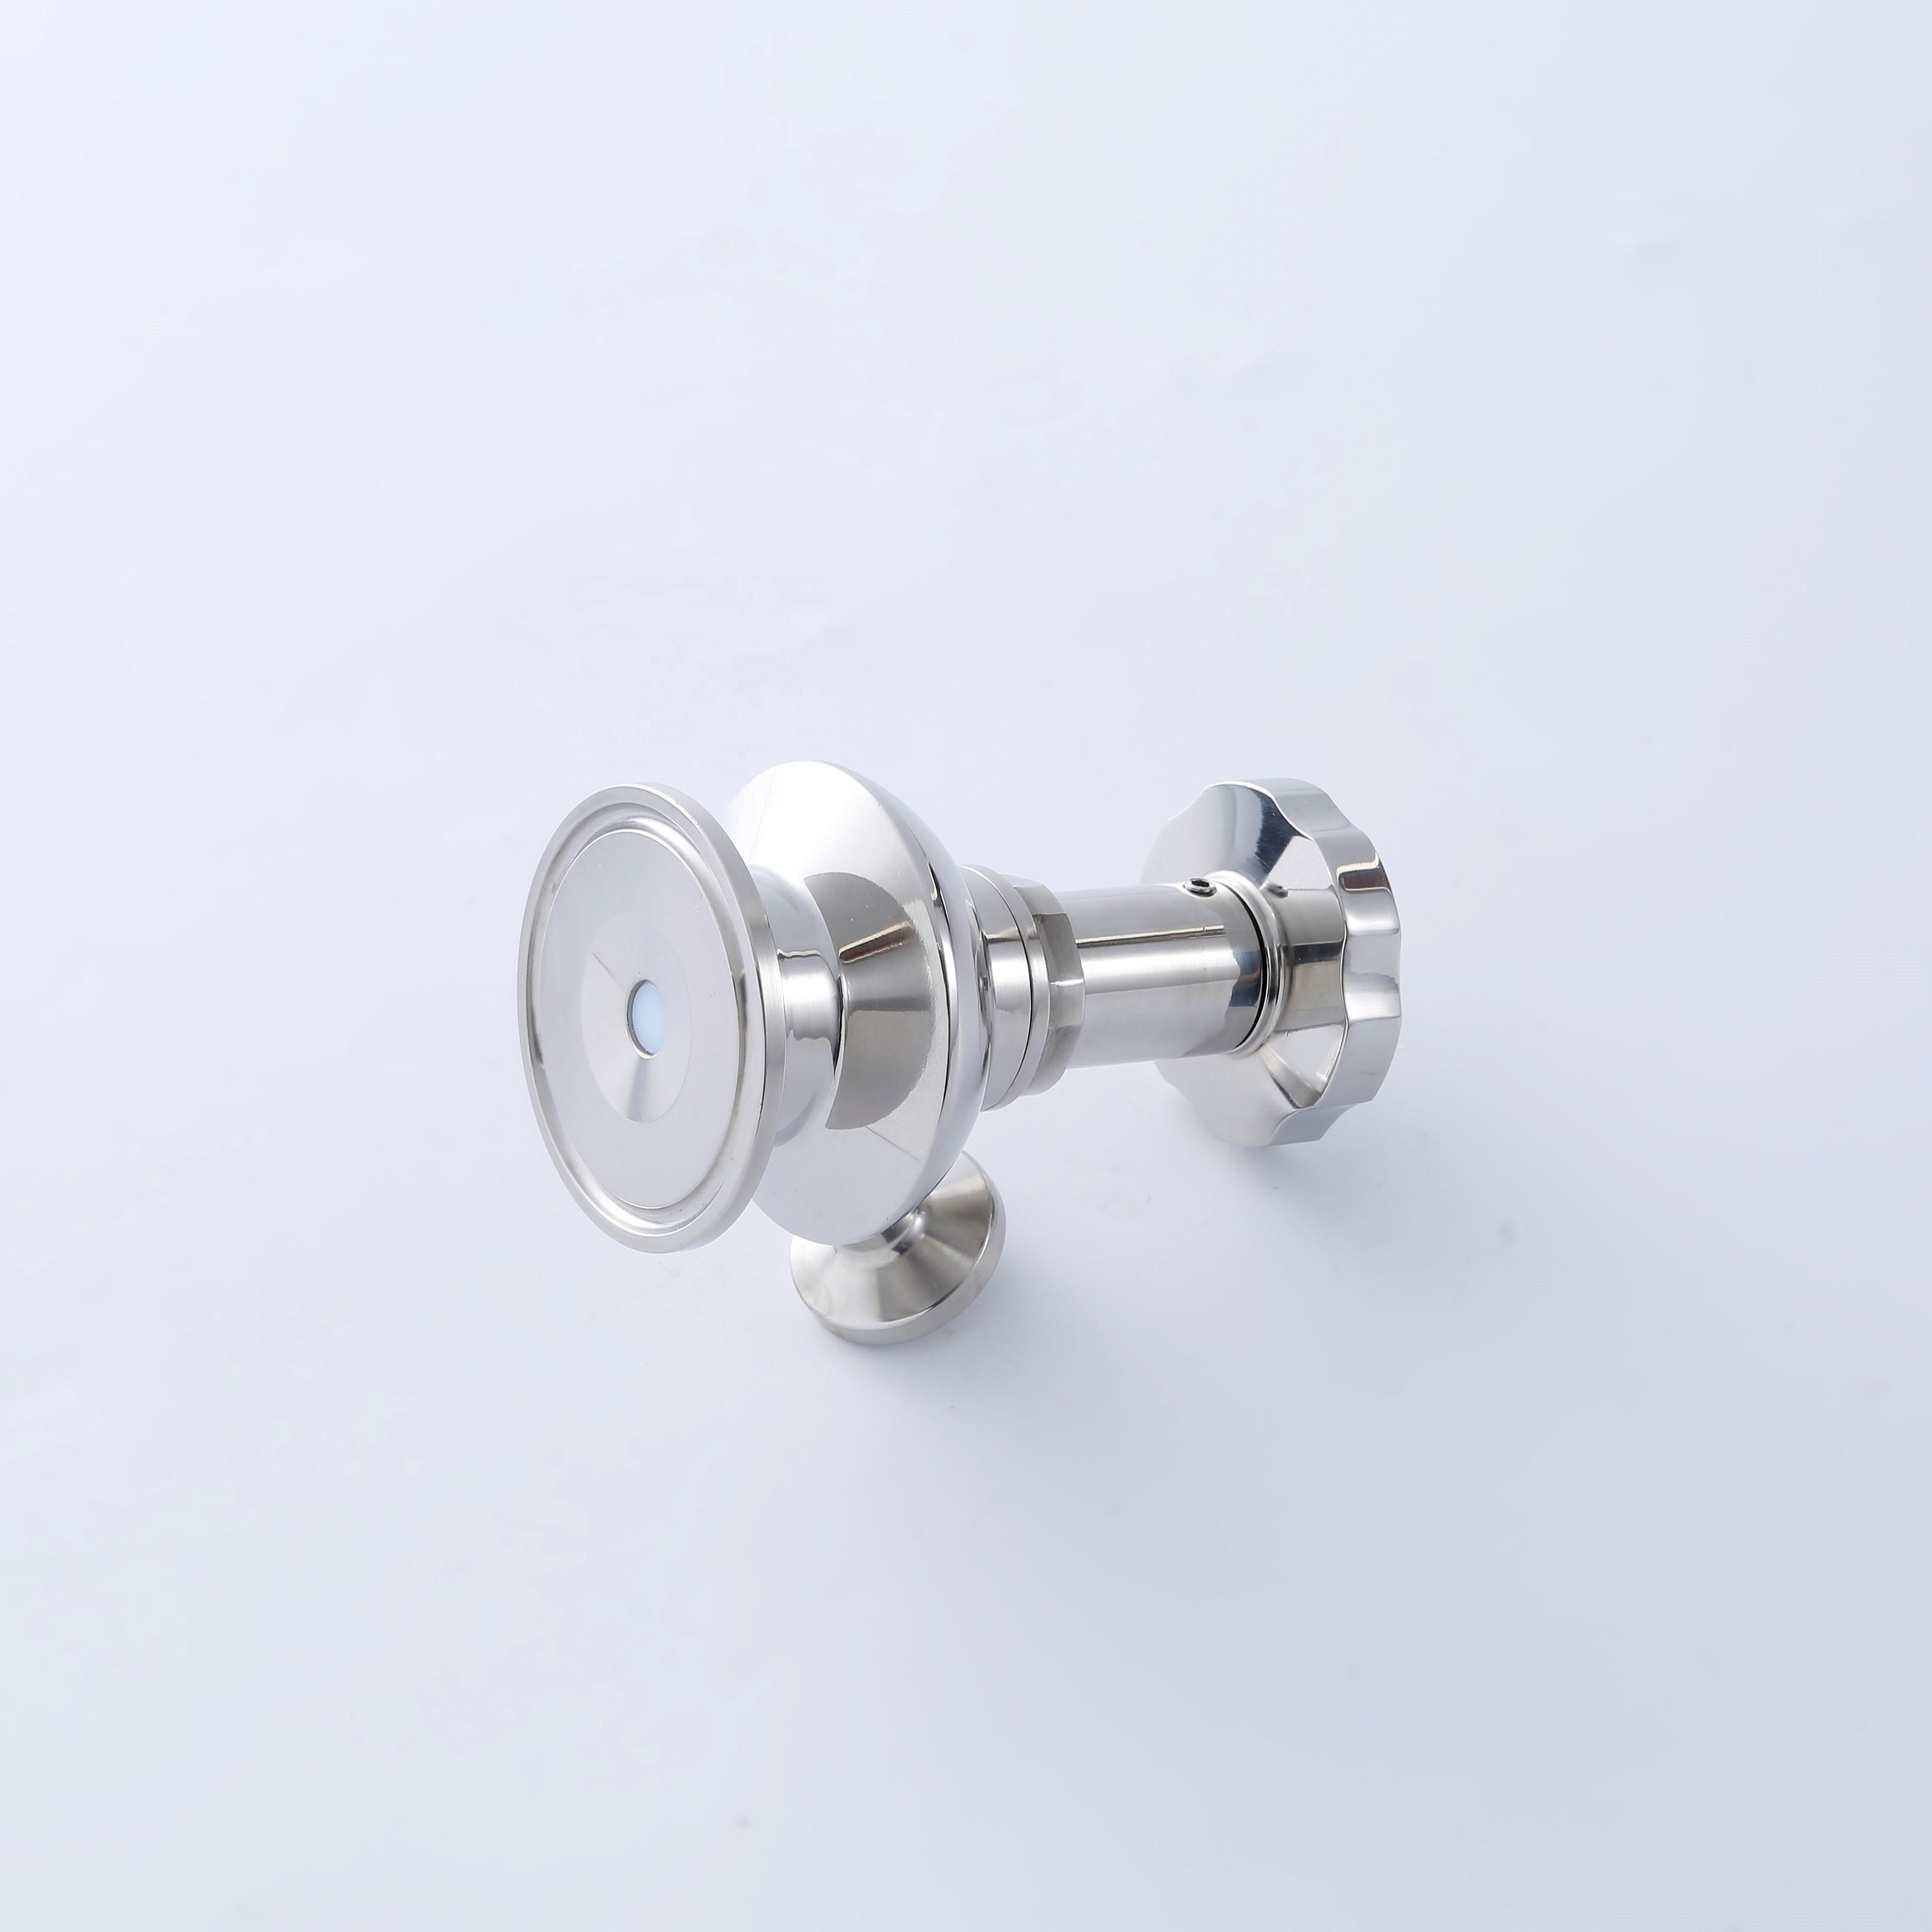 Hot sale water regulating valves sanitary stainless steel beer pneumatic sample sampling valve enlarge